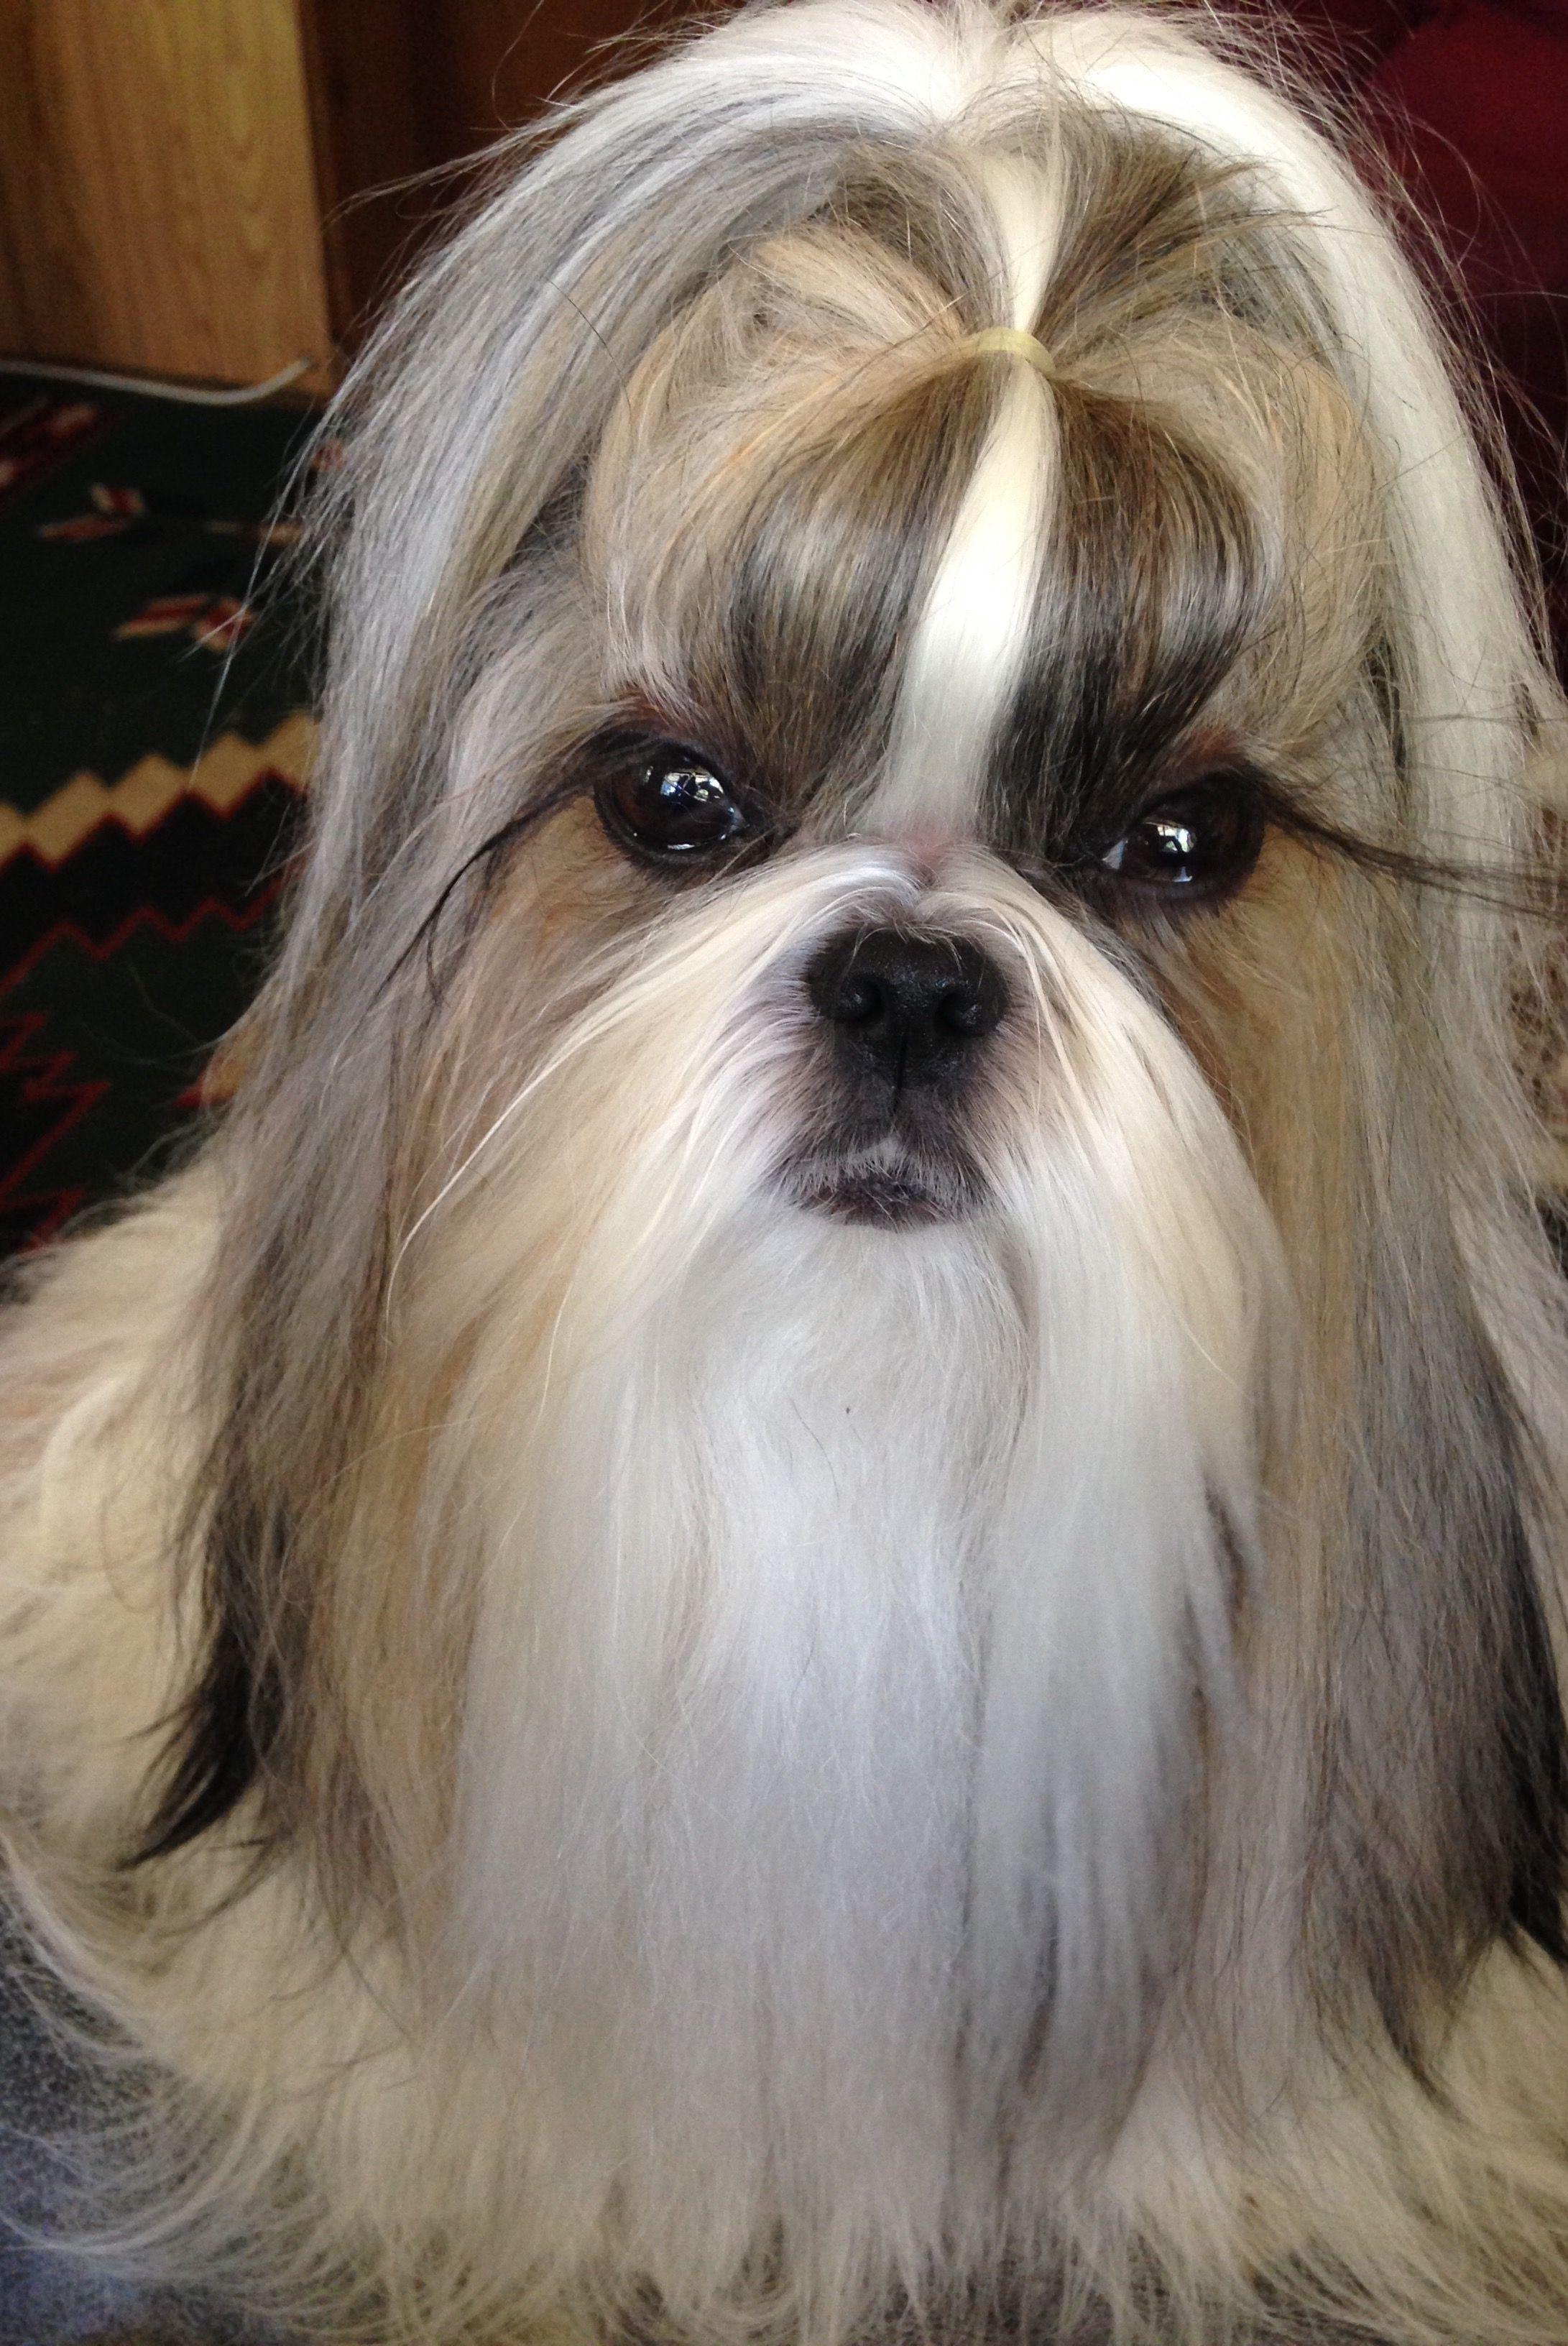 Haili Five Years Old Shih Tzu Hair Styles Shih Tzu Long Hair Shih Tzu Puppy